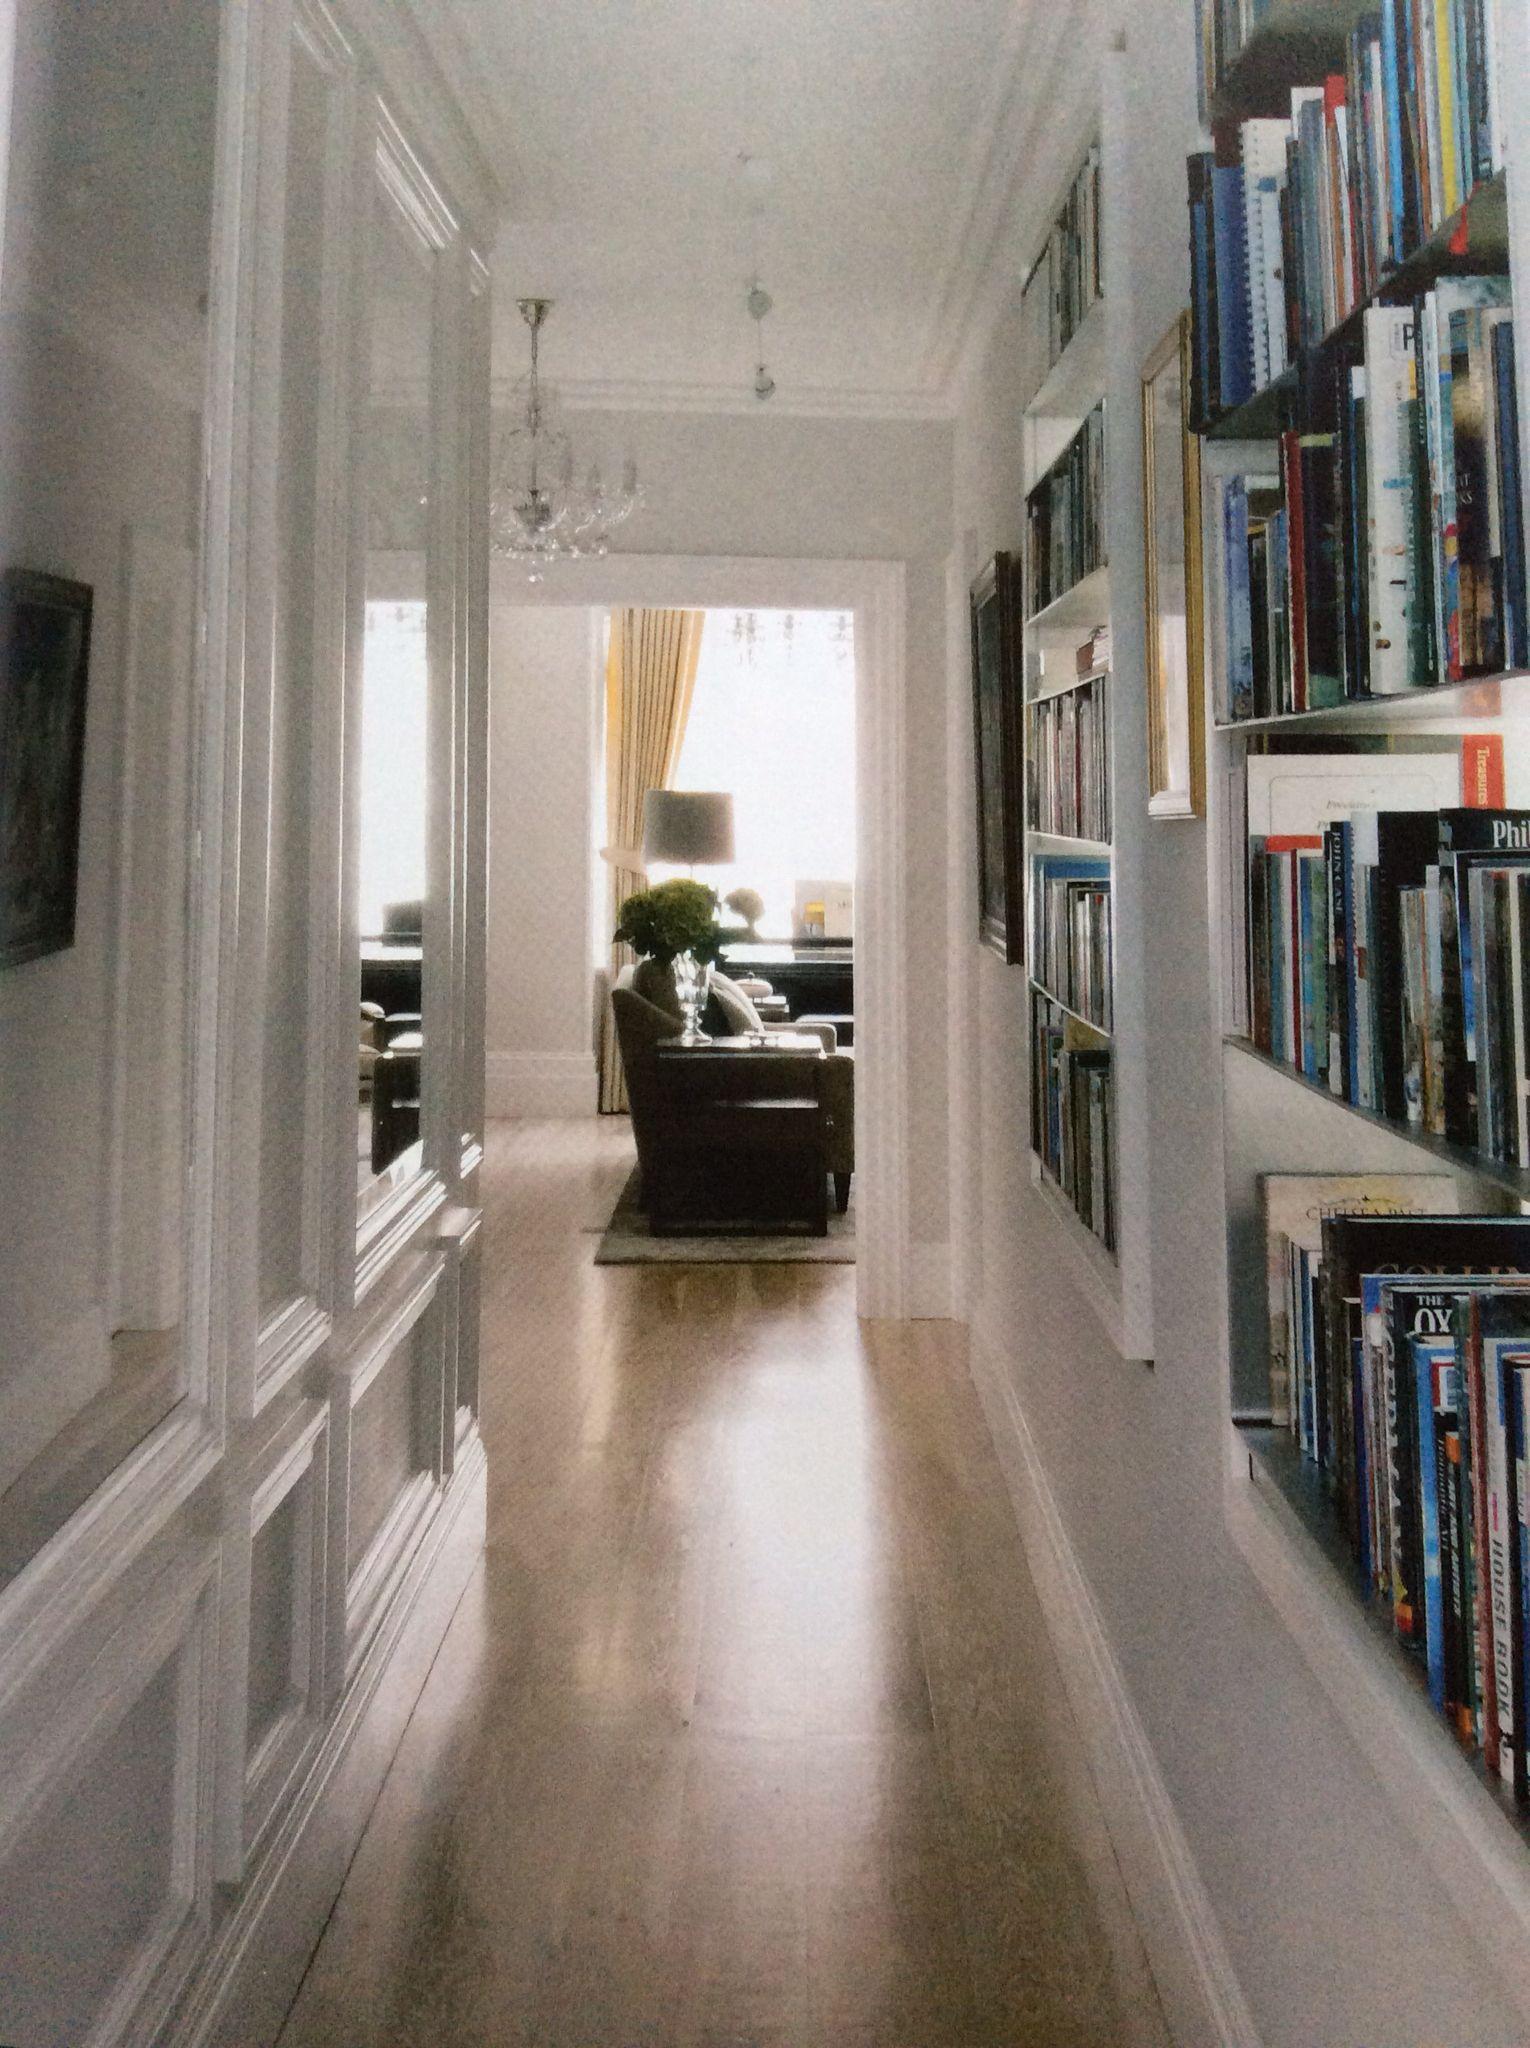 Hol z książkami i lustra atelier pinterest